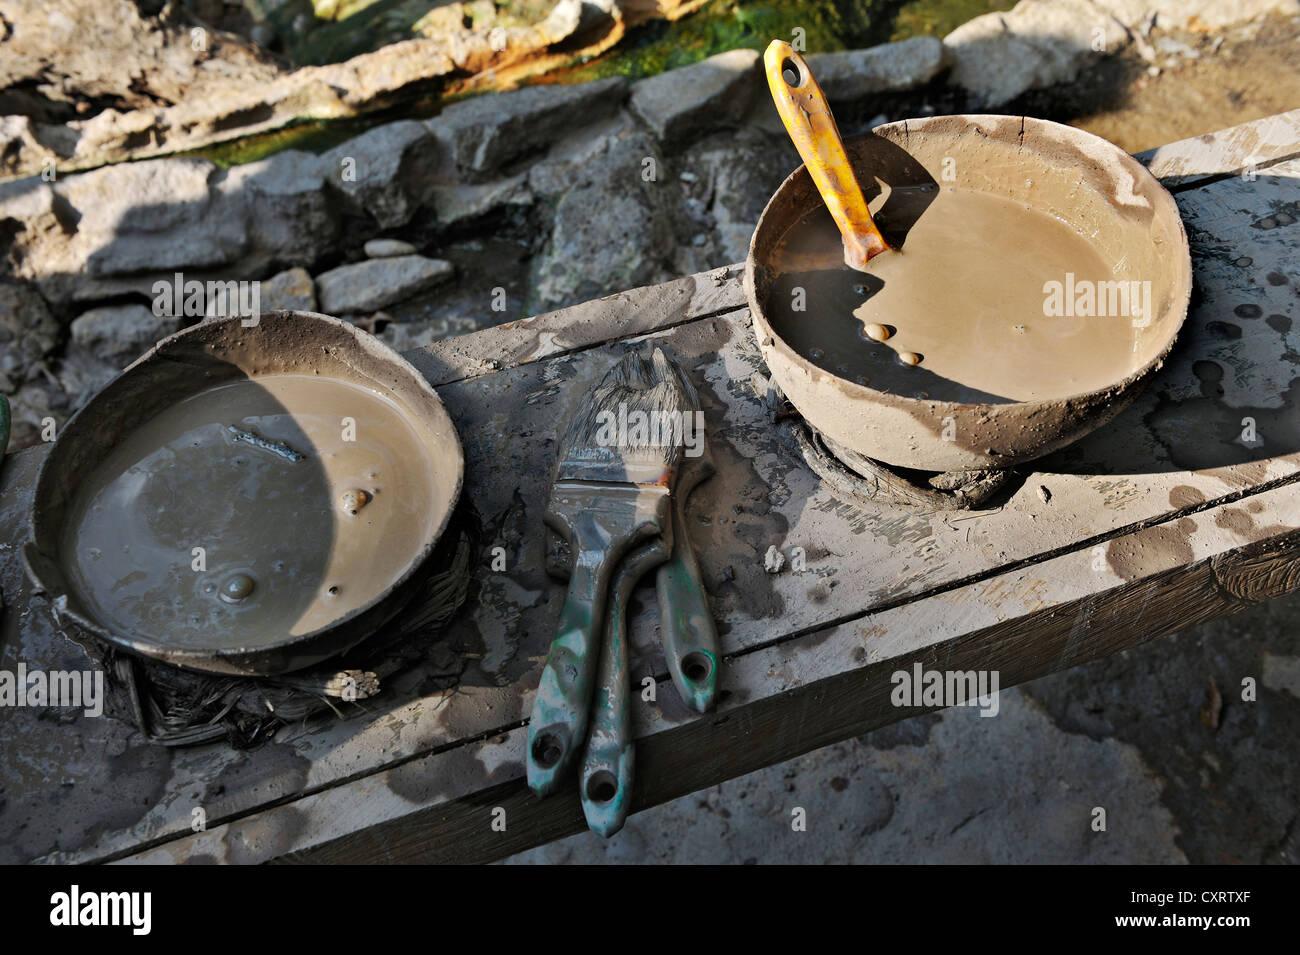 Healing mud in bowls with brushes near the hot springs, near the Hacienda Guachipelin, near Liberia, Guanacaste - Stock Image